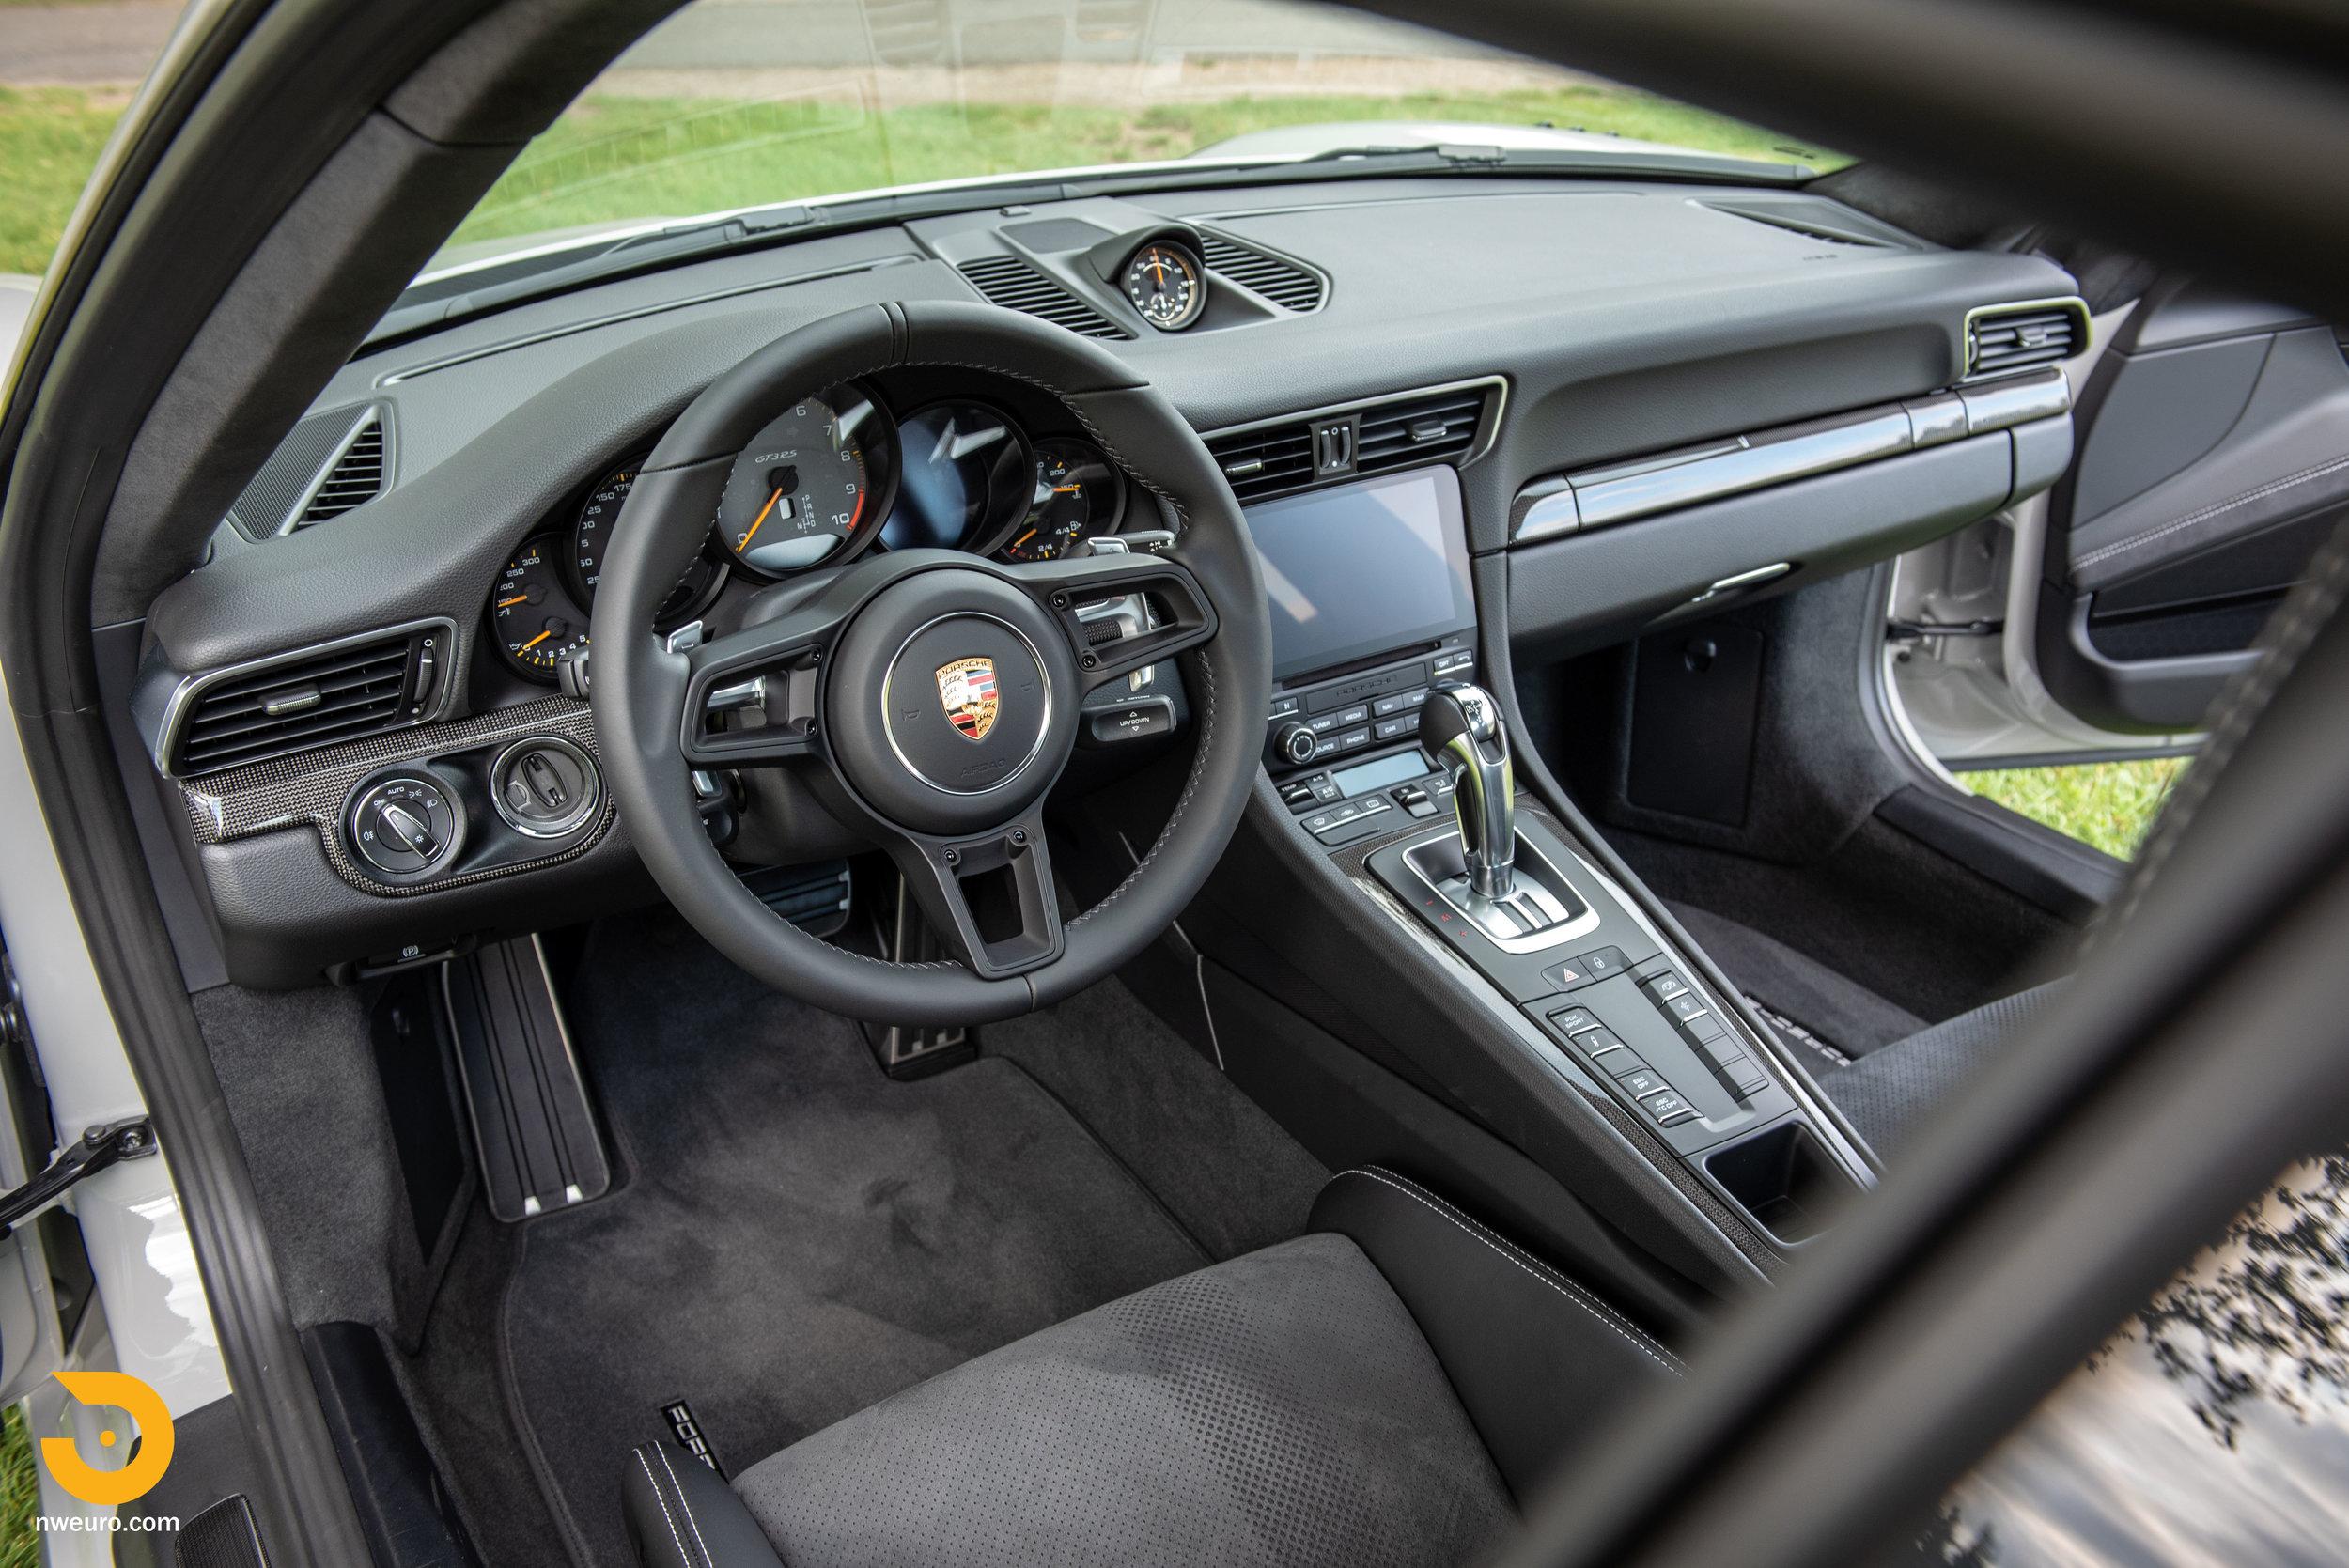 2019 Porsche GT3 RS - Chalk-44.jpg